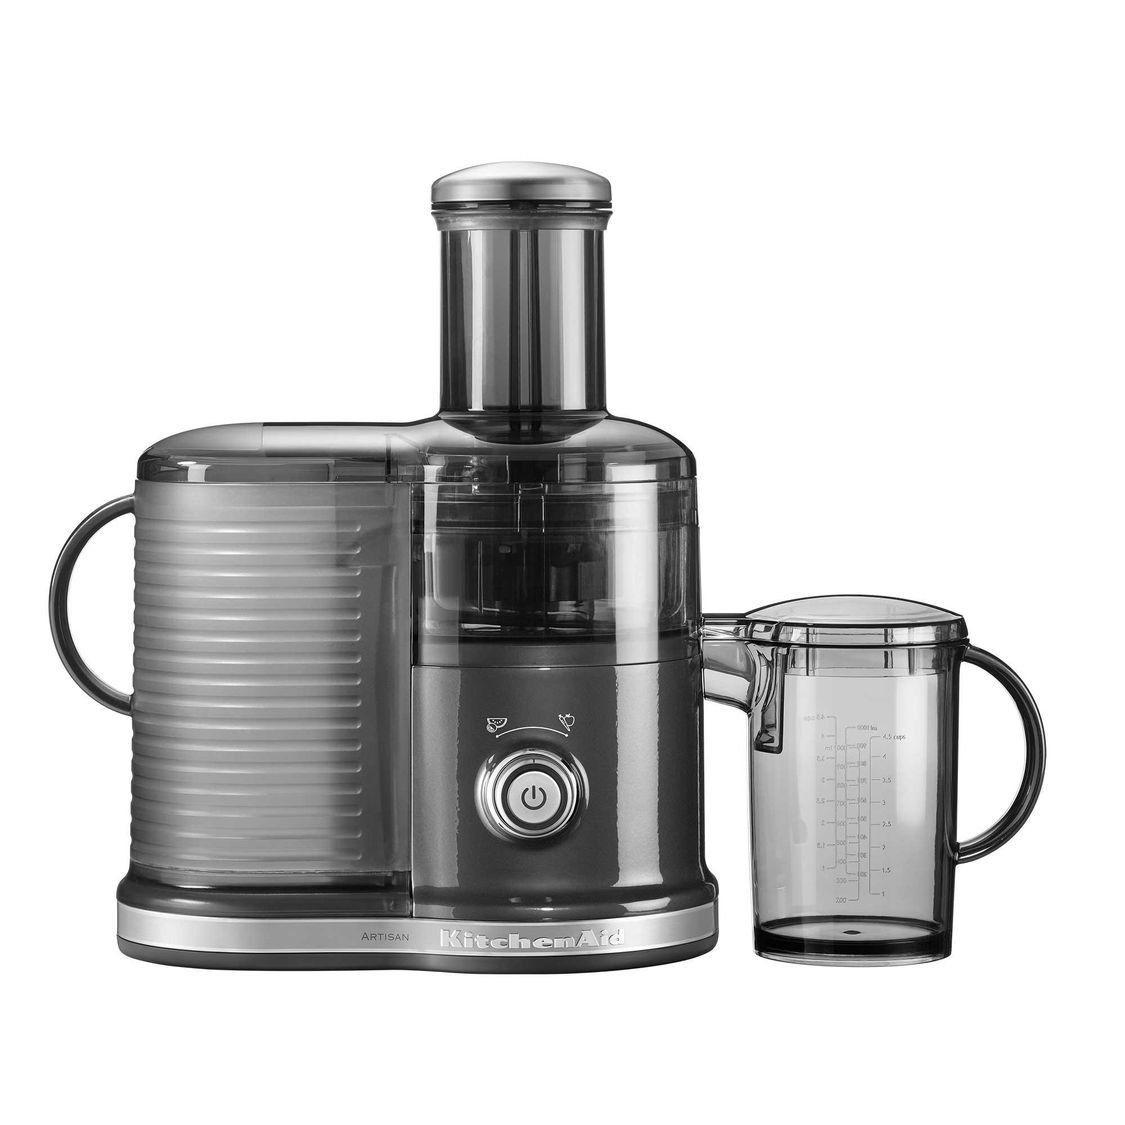 Artisan 5KVJ0332 Juicer Centrifugal   KitchenAid   AmbienteDirect.com